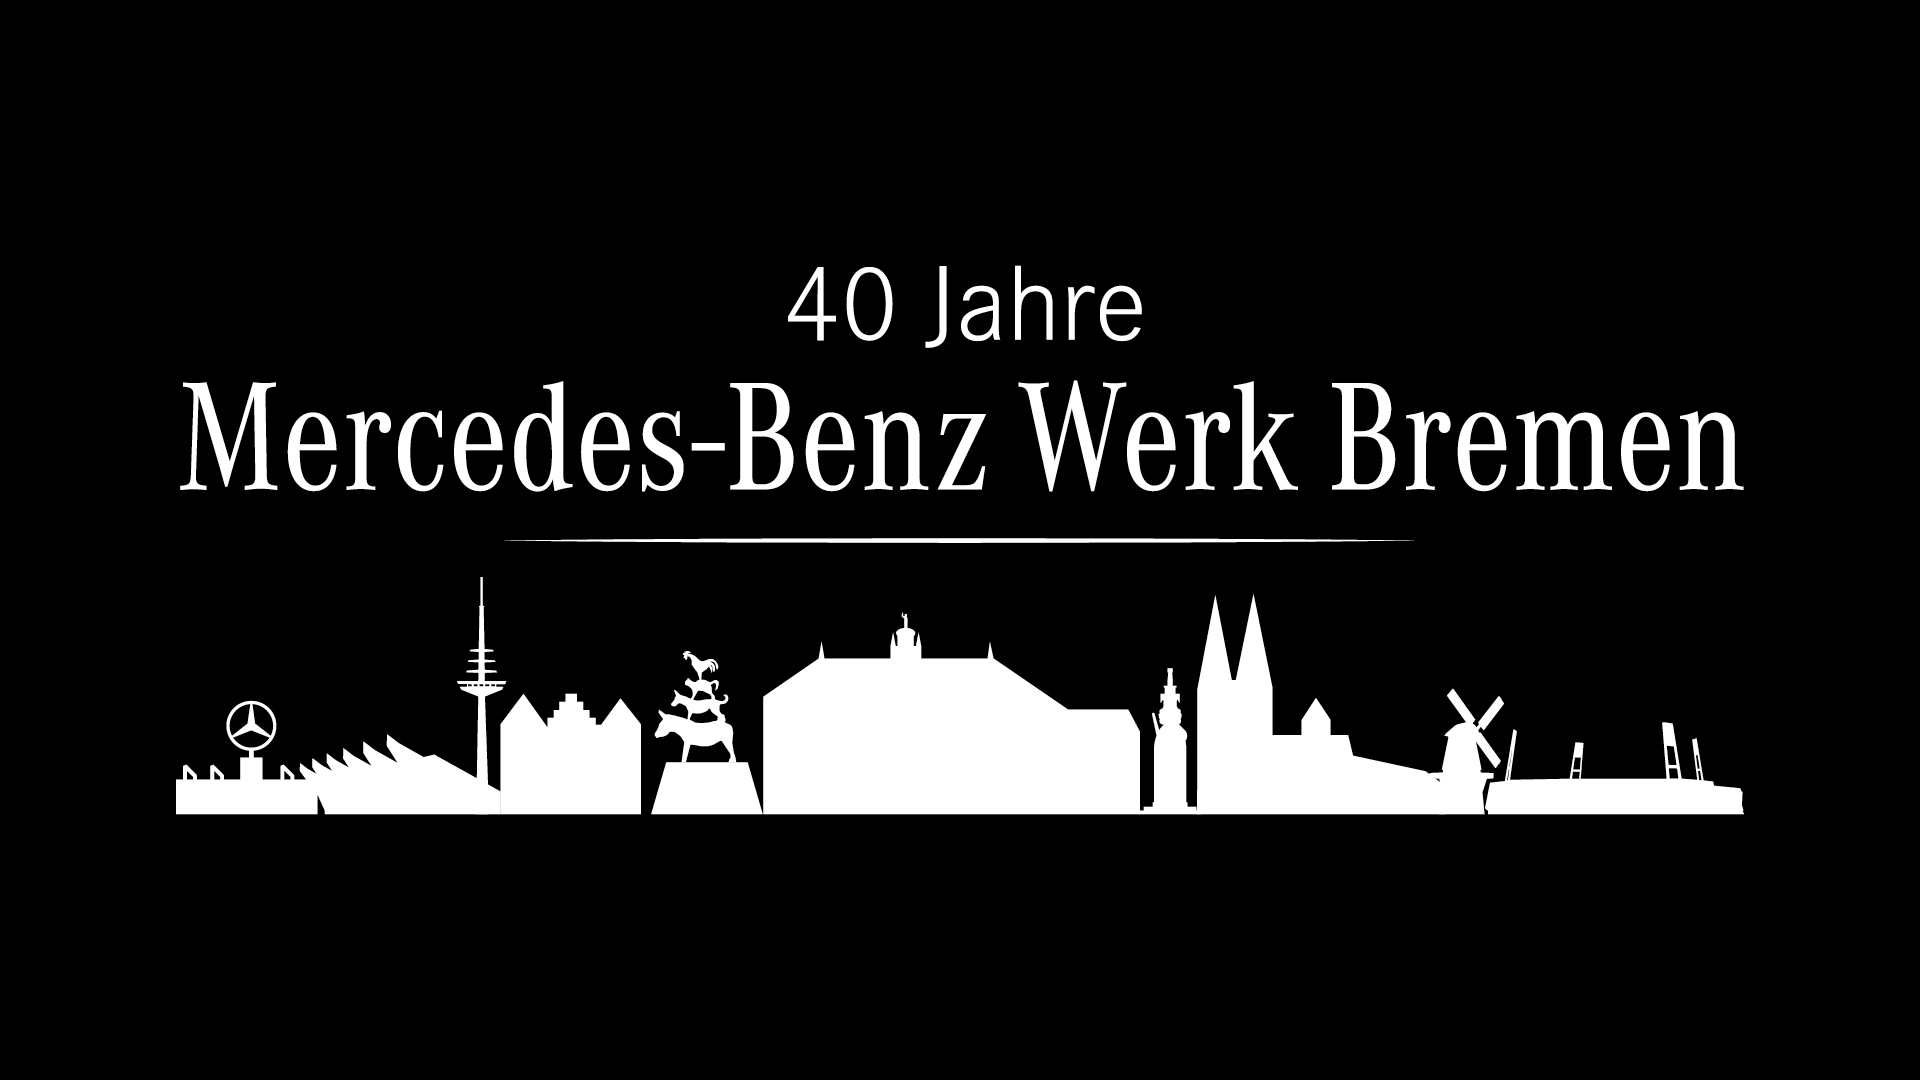 180731_Mercedes-Benz_Jubiläumslogo